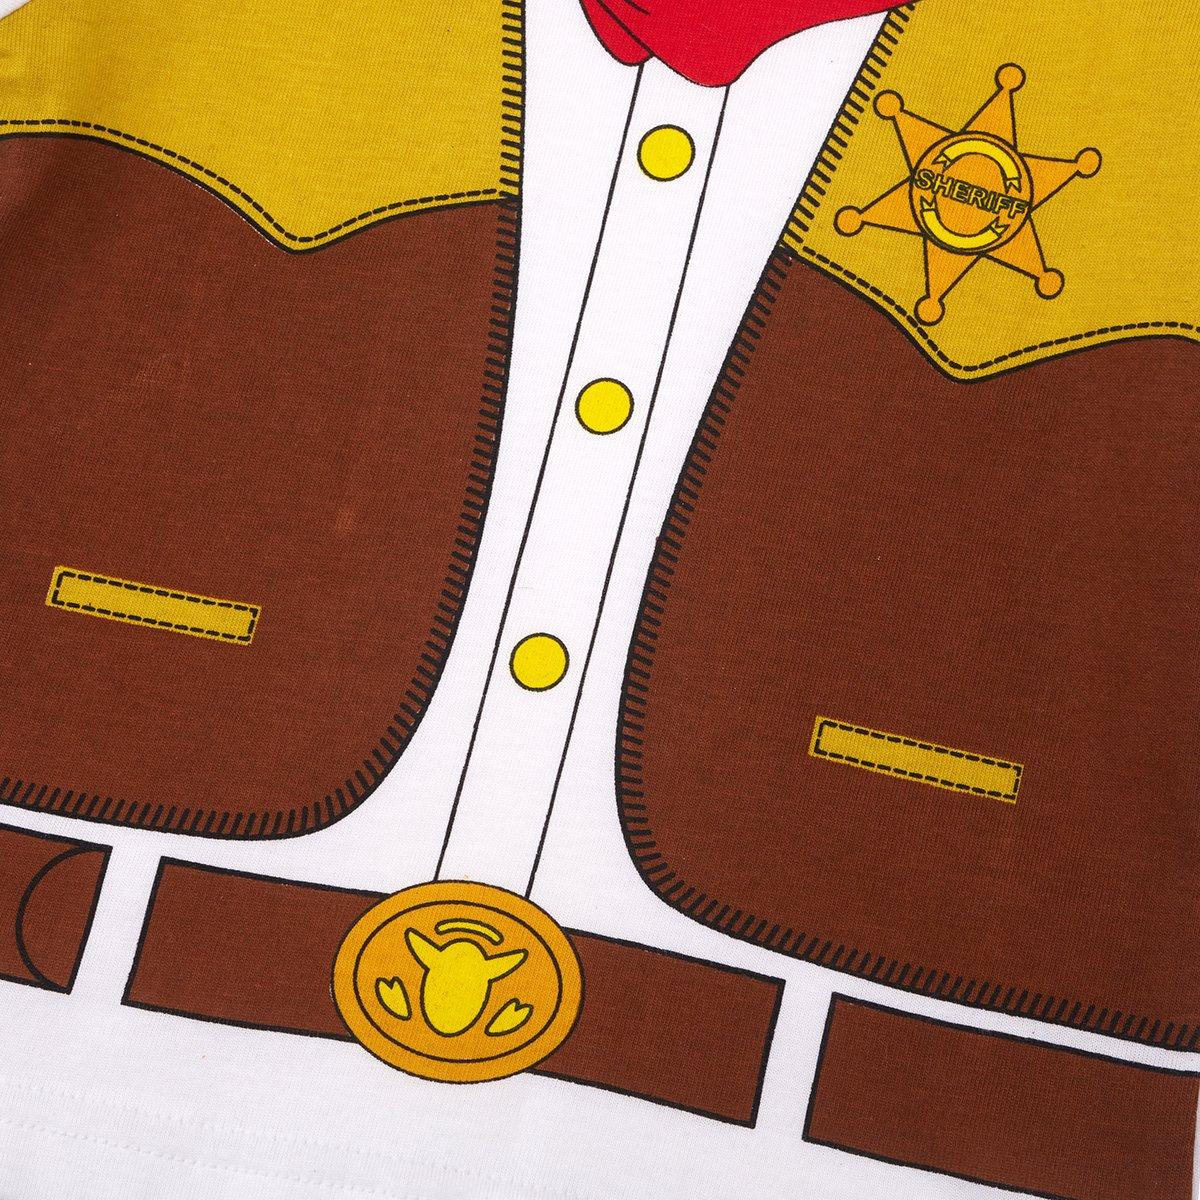 12-18 Months, Cowboy Baby Boys 2 Pieces Western Cowboy Costume Shorts Sets